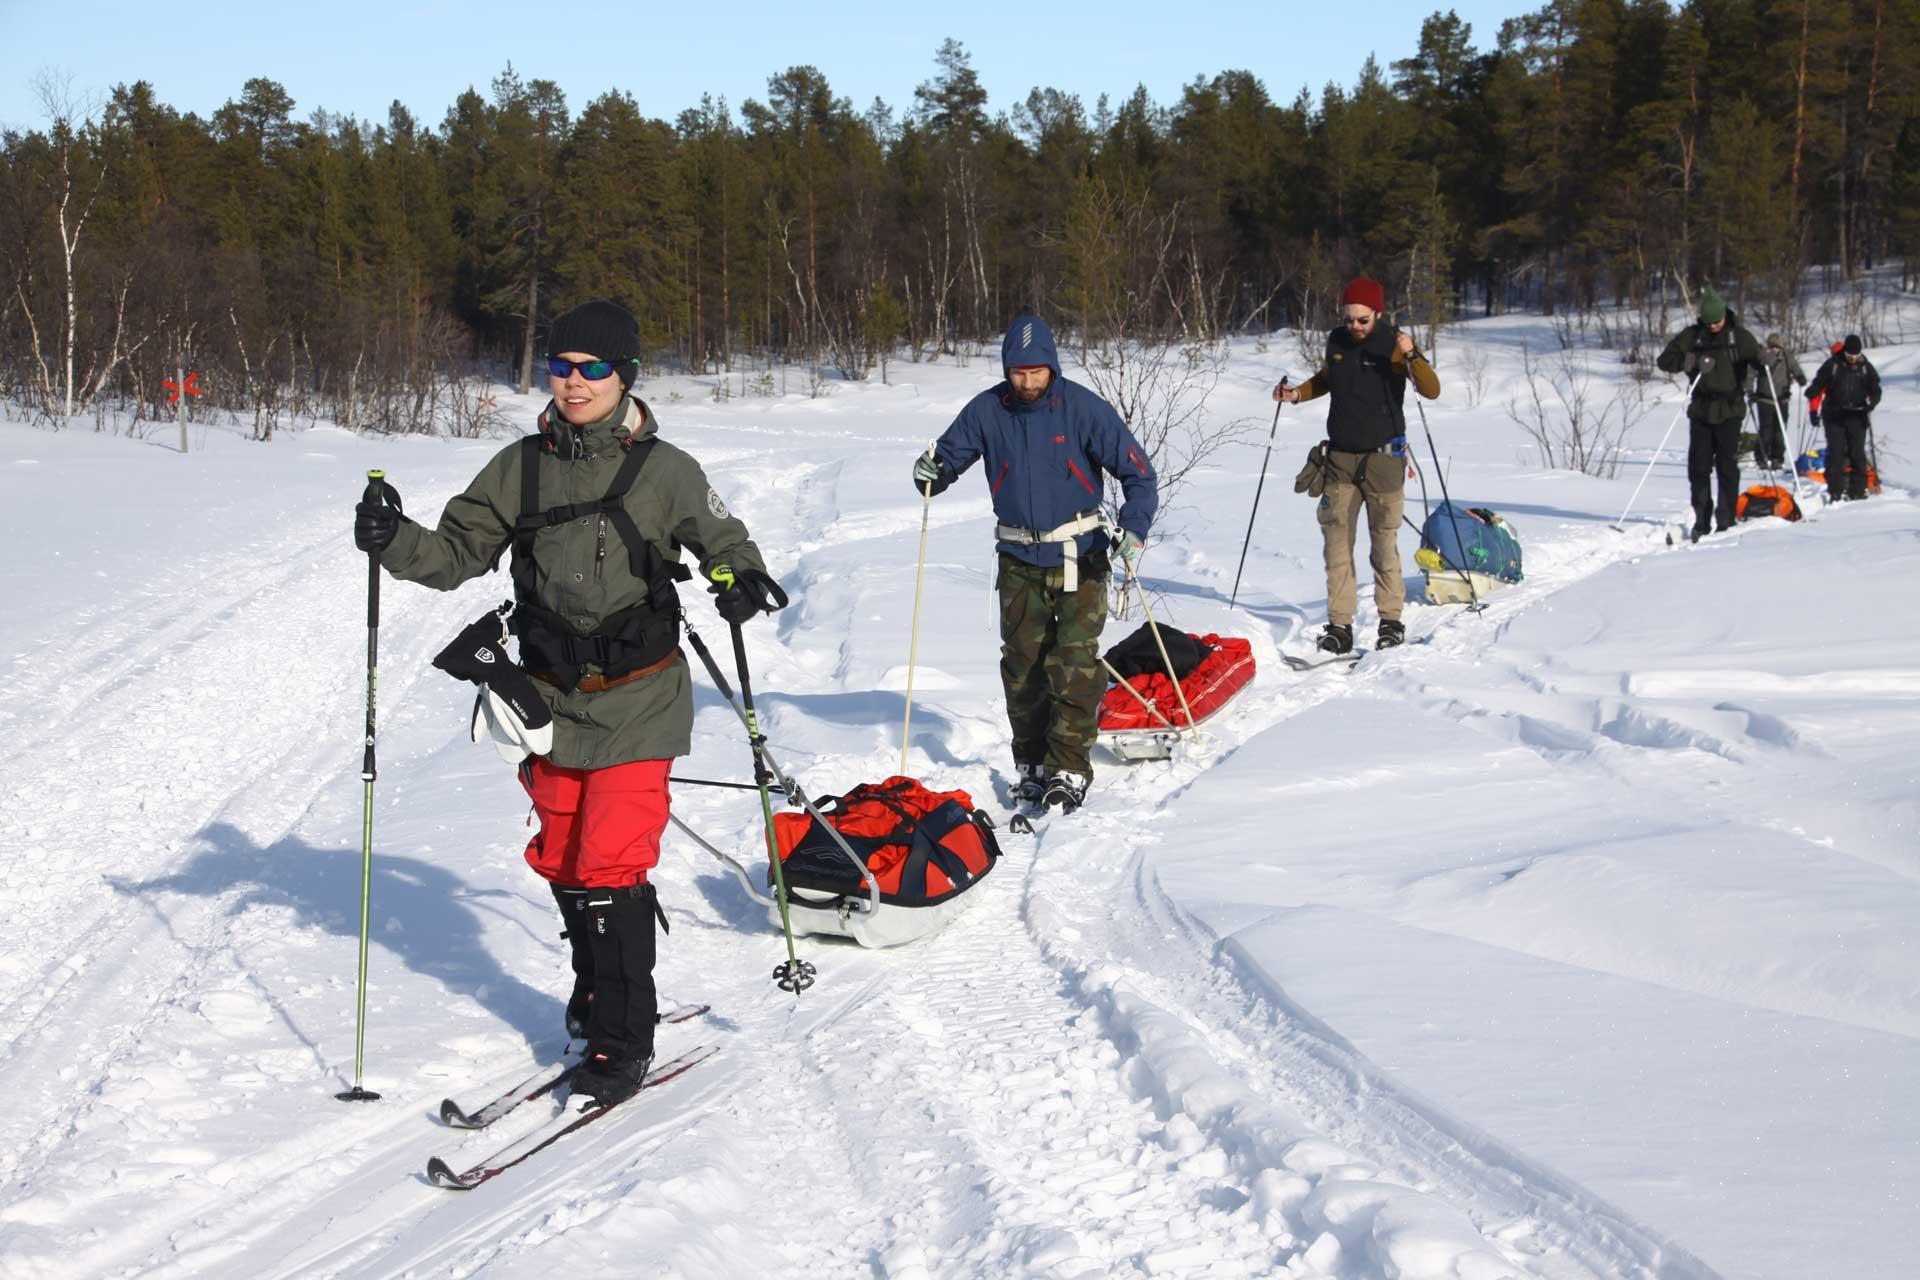 talvivaellus peruskurssi polku nature tours